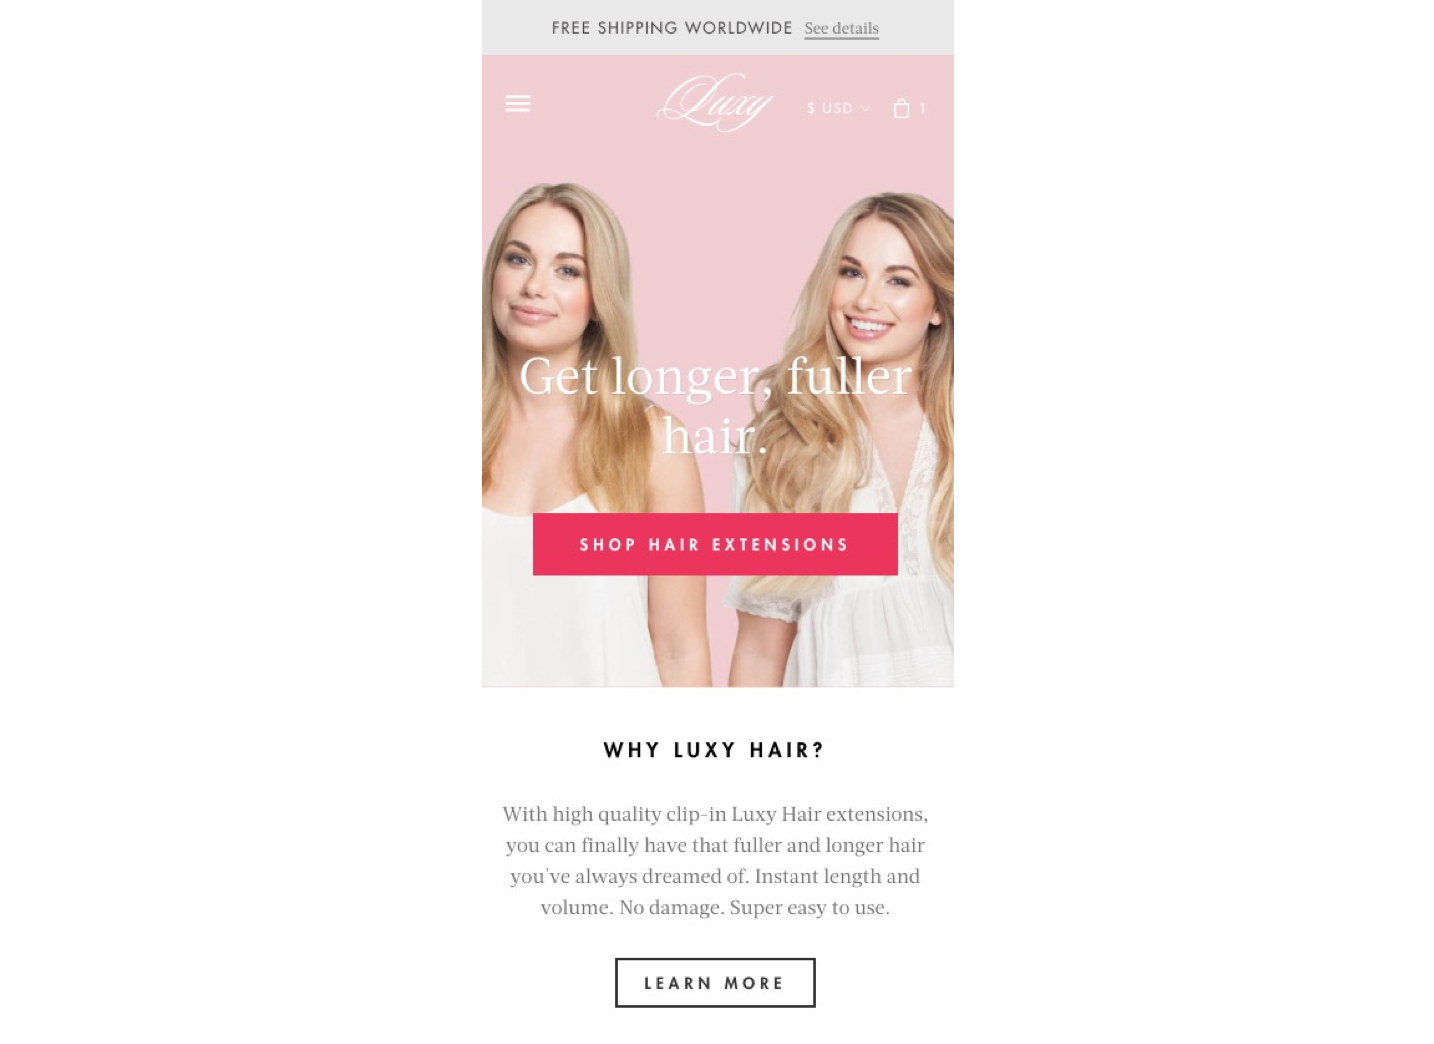 Image of mobile screen displaying two women